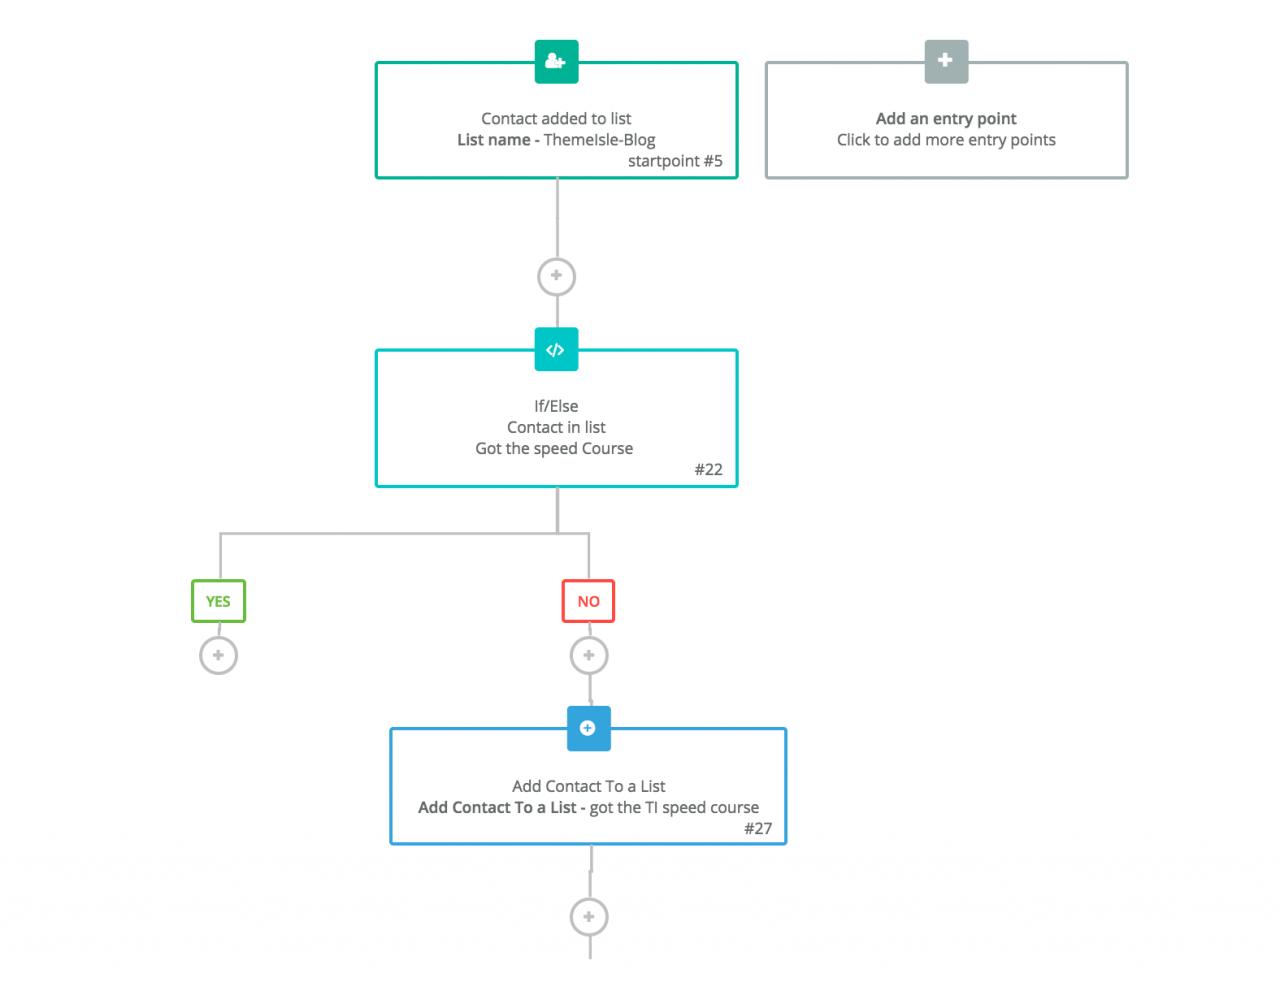 sendinblue工作流程